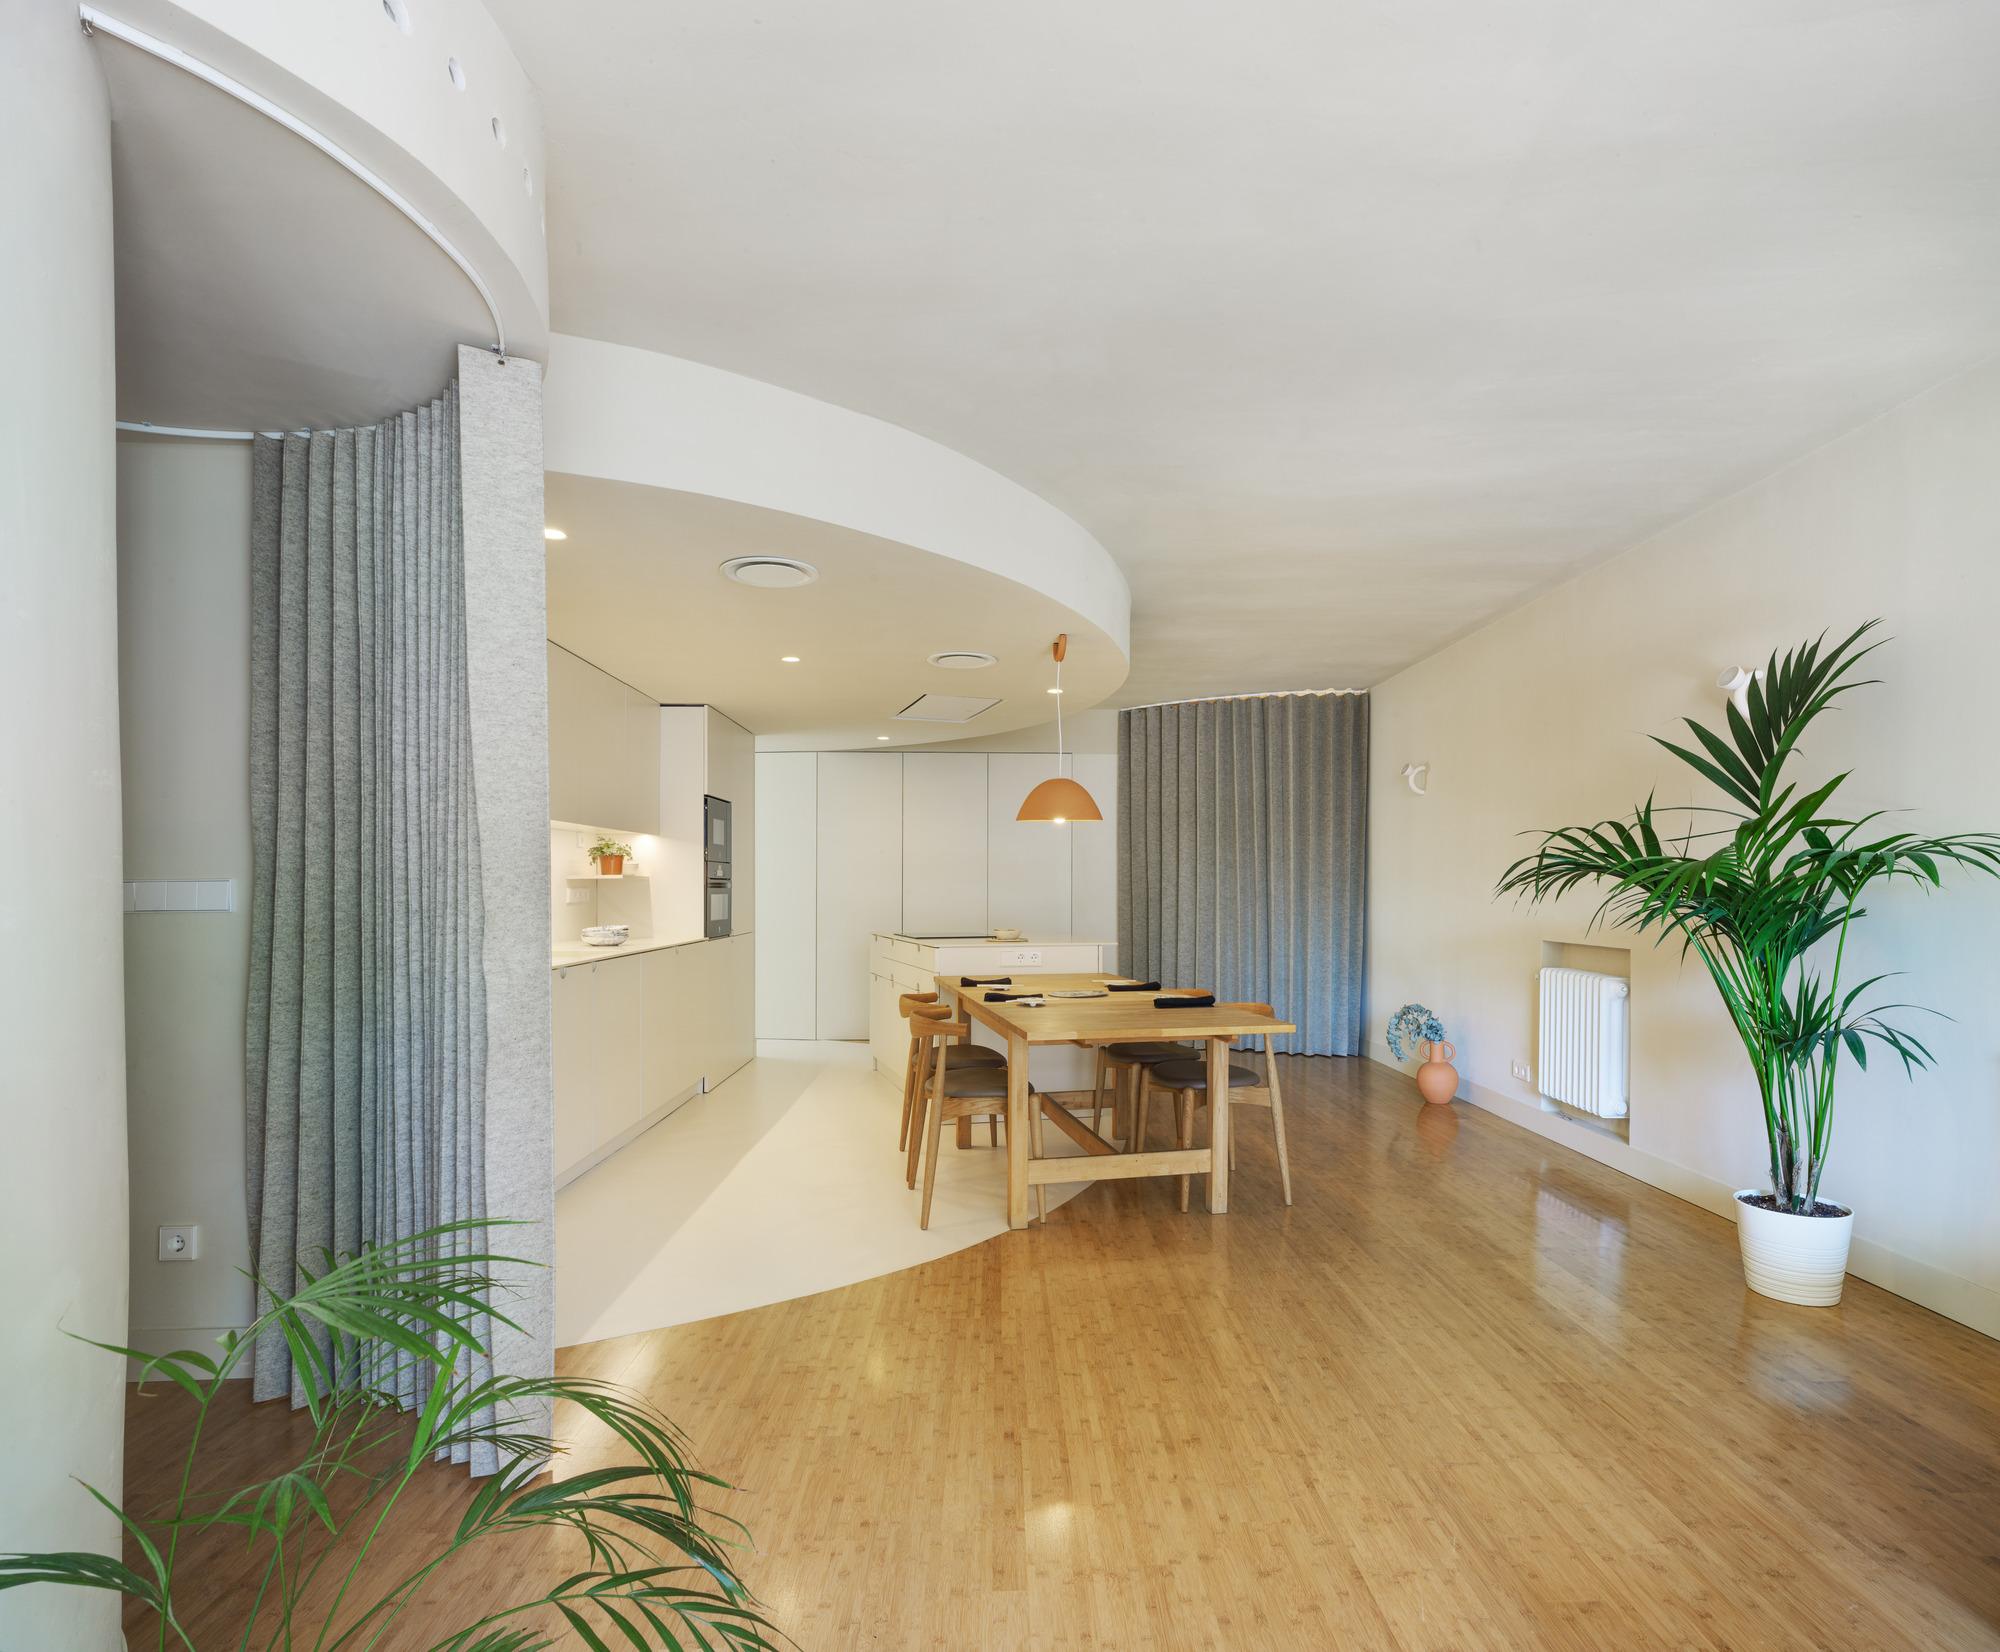 MO House / Laura Ortín Arquitectura